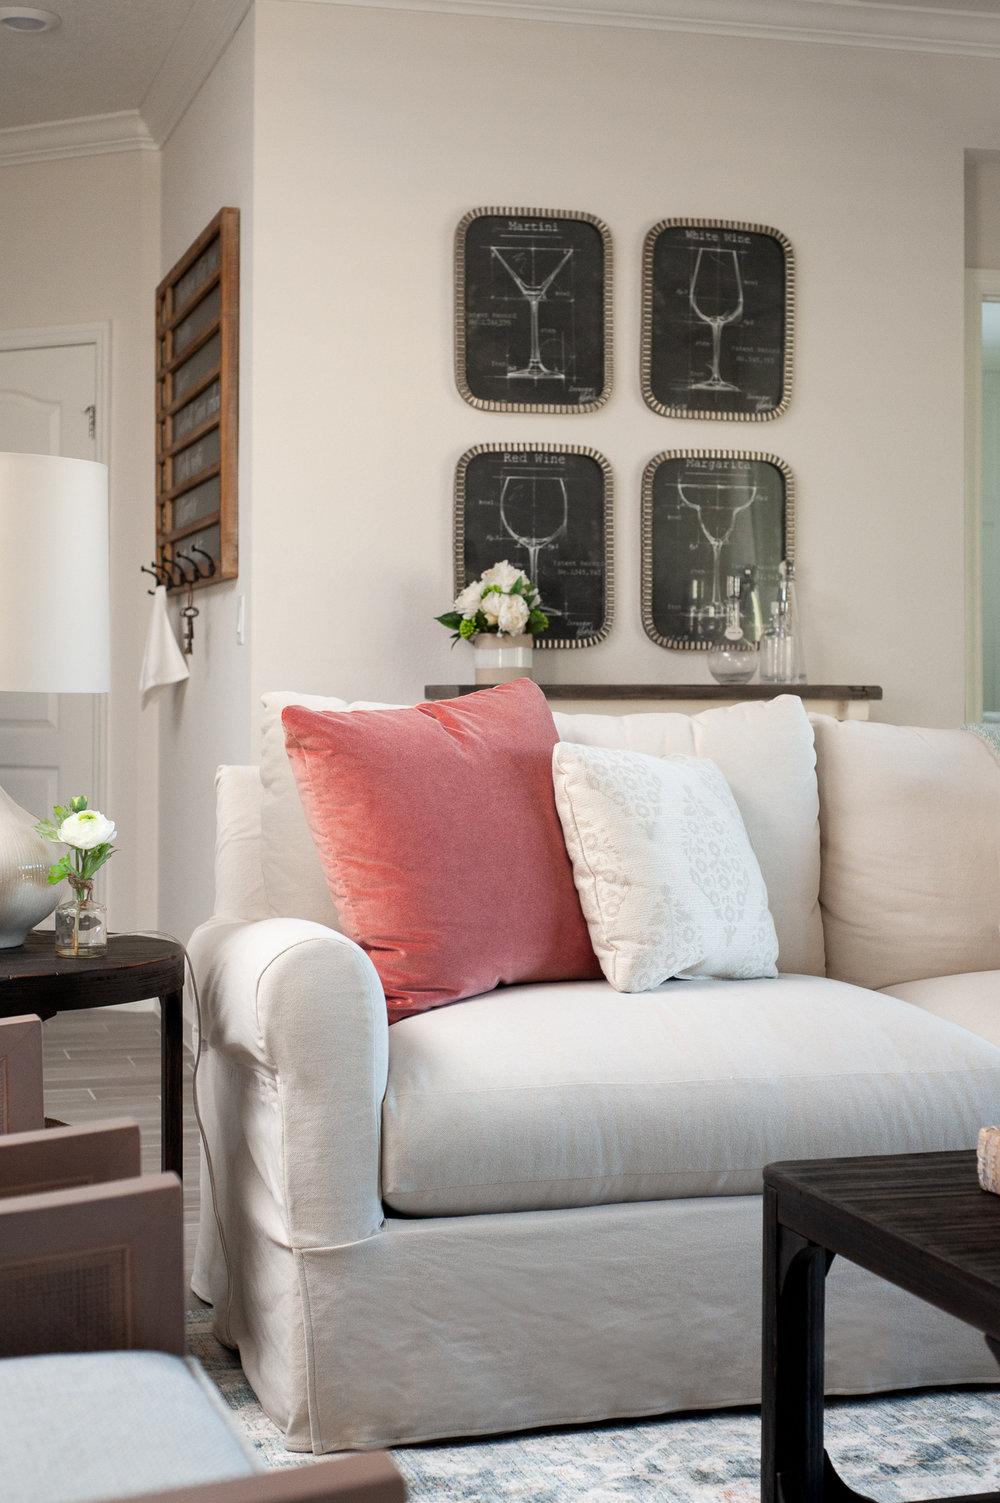 Micamy_Interior Designer_Design_Interior_Model_Merchandising_Living_Room_Rowe_Furniture_Traditional_Transitional_Bar_McGee & Co_Shiplap_Rug_Pillows.jpg